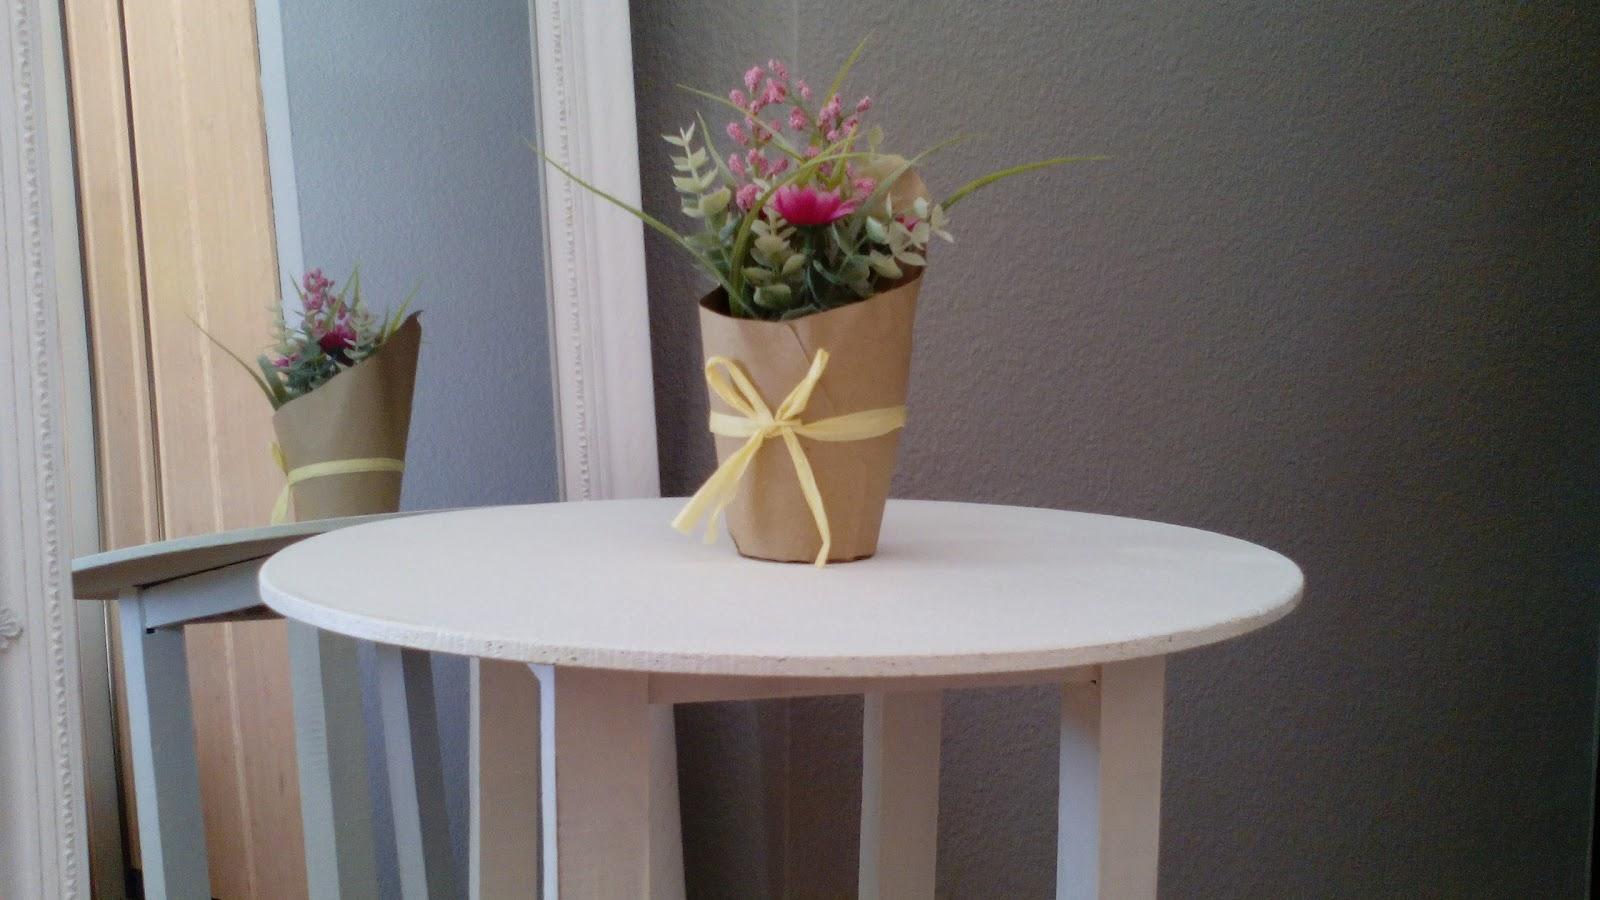 Manualidades yolohago pintar a la tiza - La mesa camilla ...